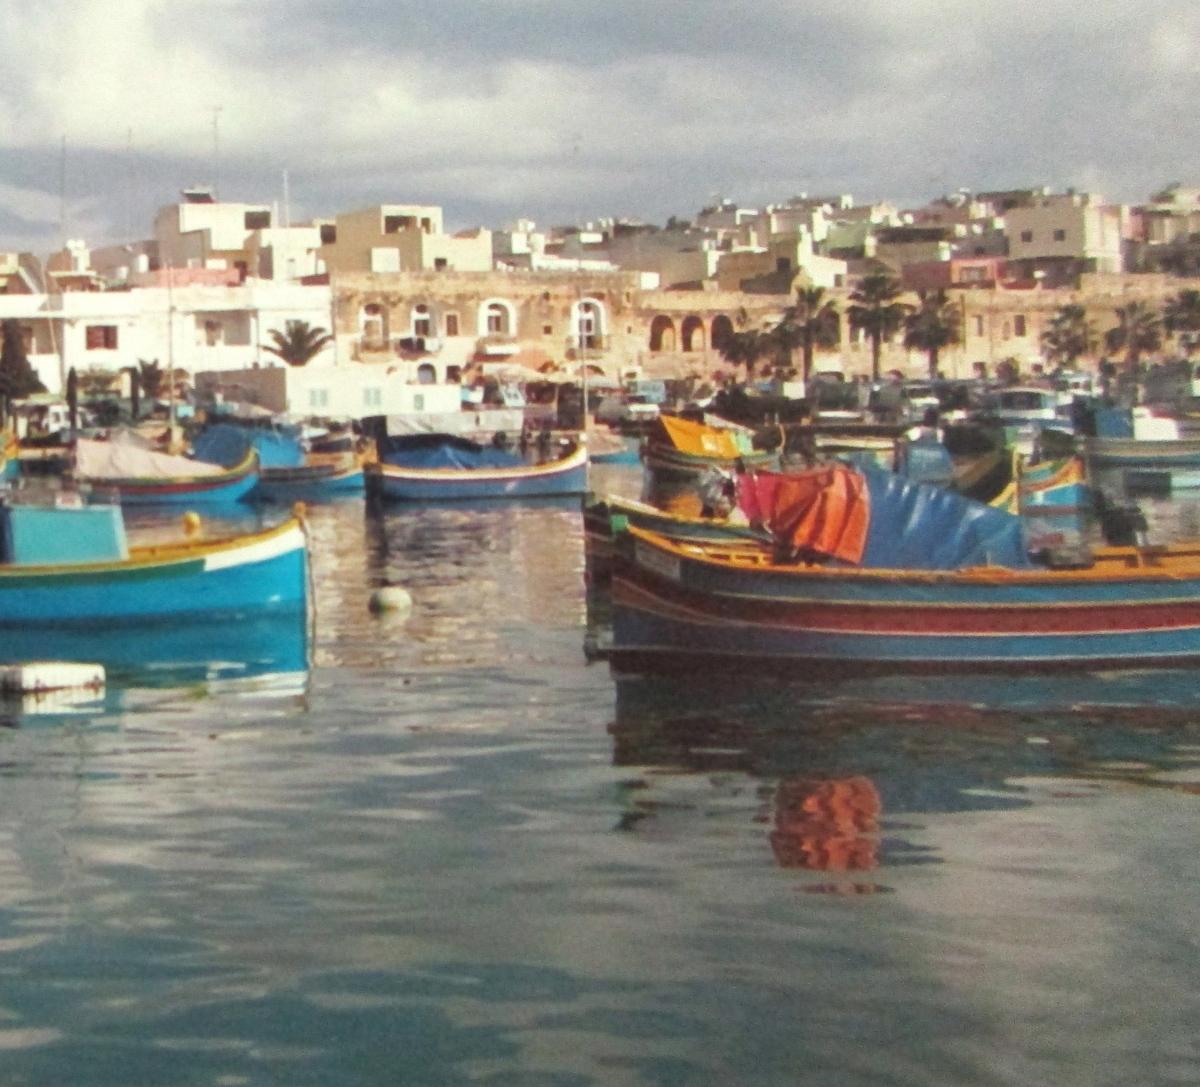 Malta's Marsaxlokk fishing village